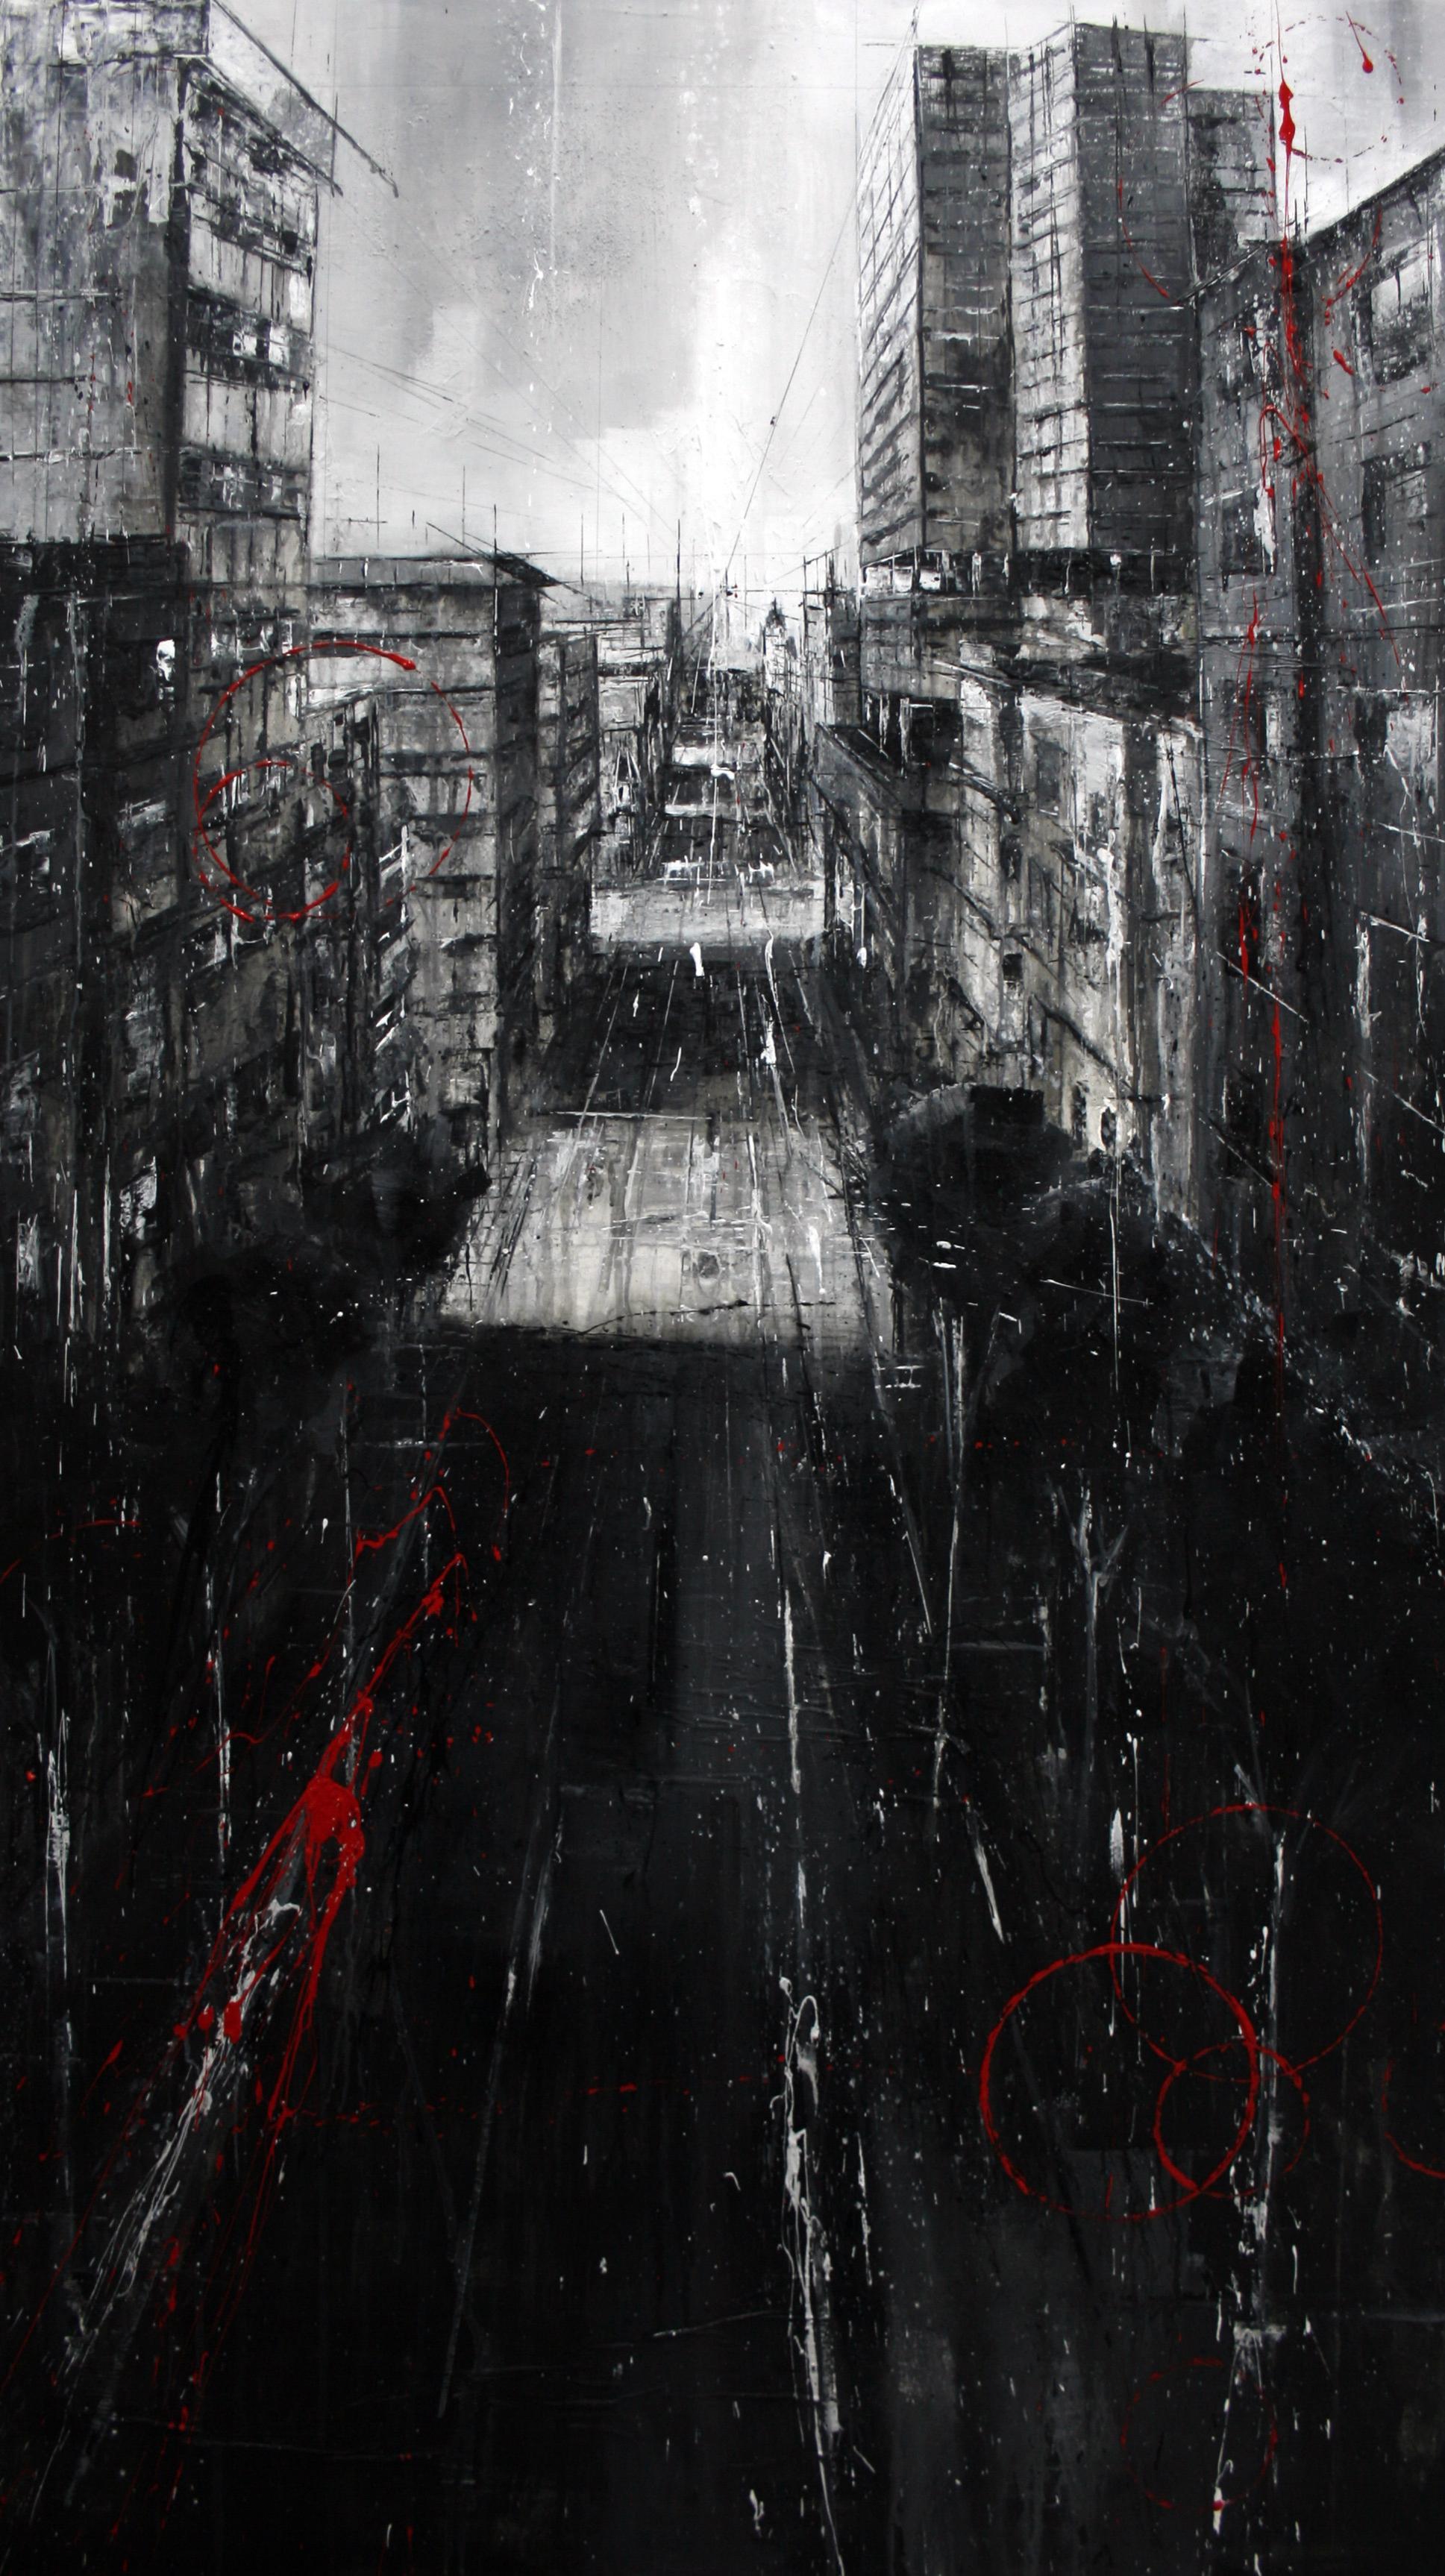 740_cabo santiago gómez_95x165cm_mixed on canvas